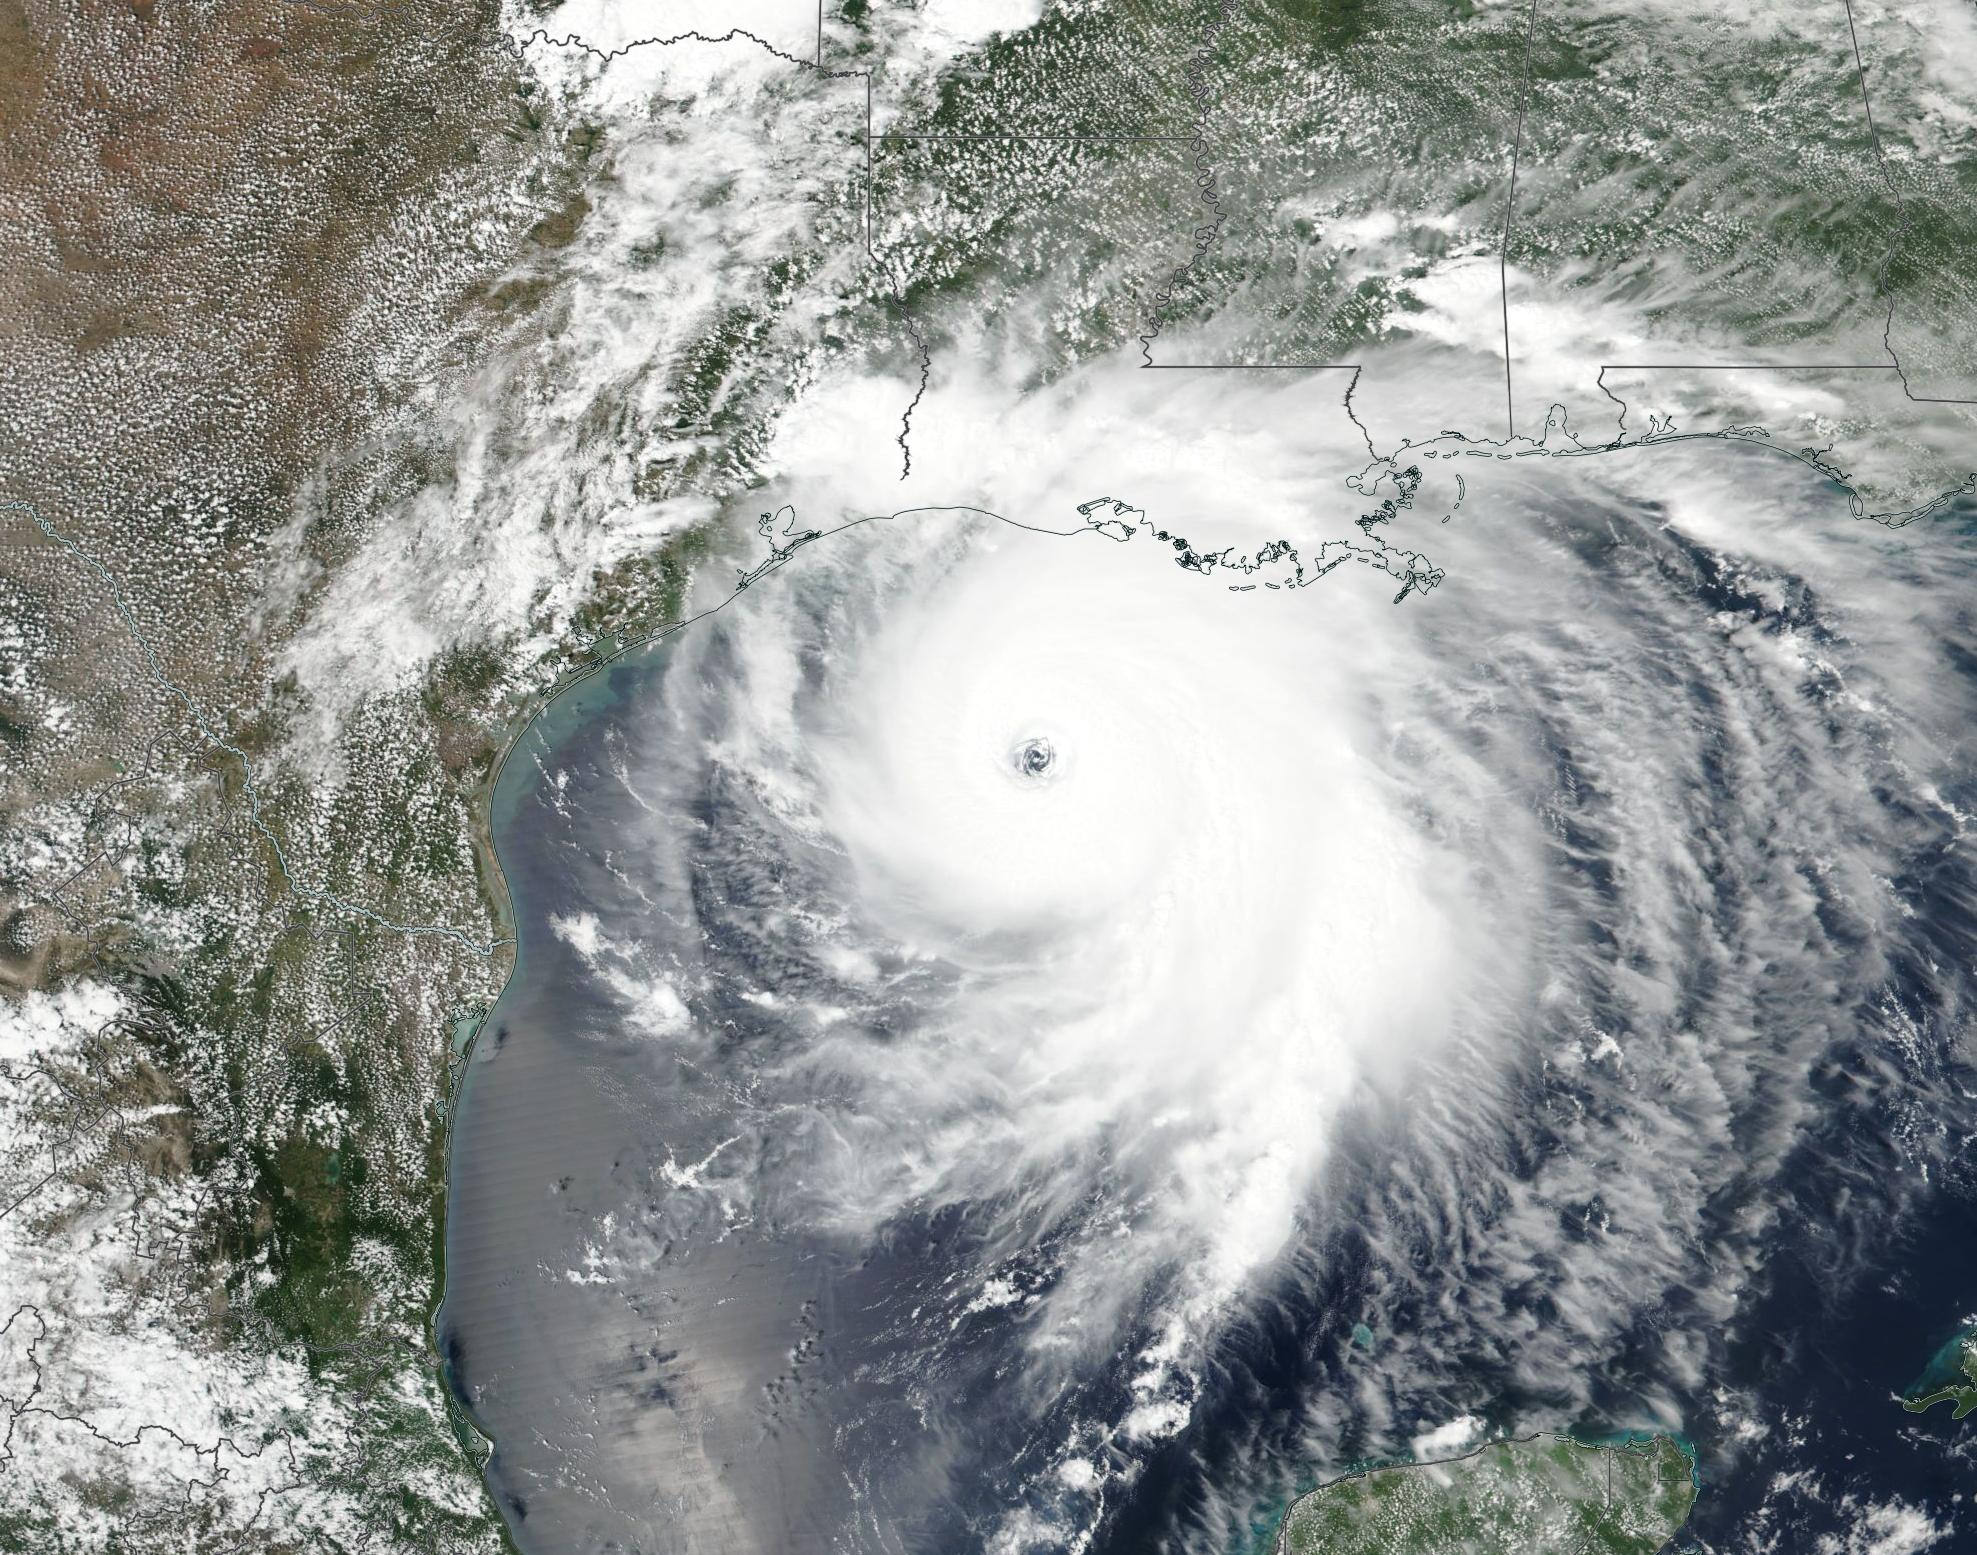 Hurricane season expected to be above-average as forecasting improves - WISH-TV